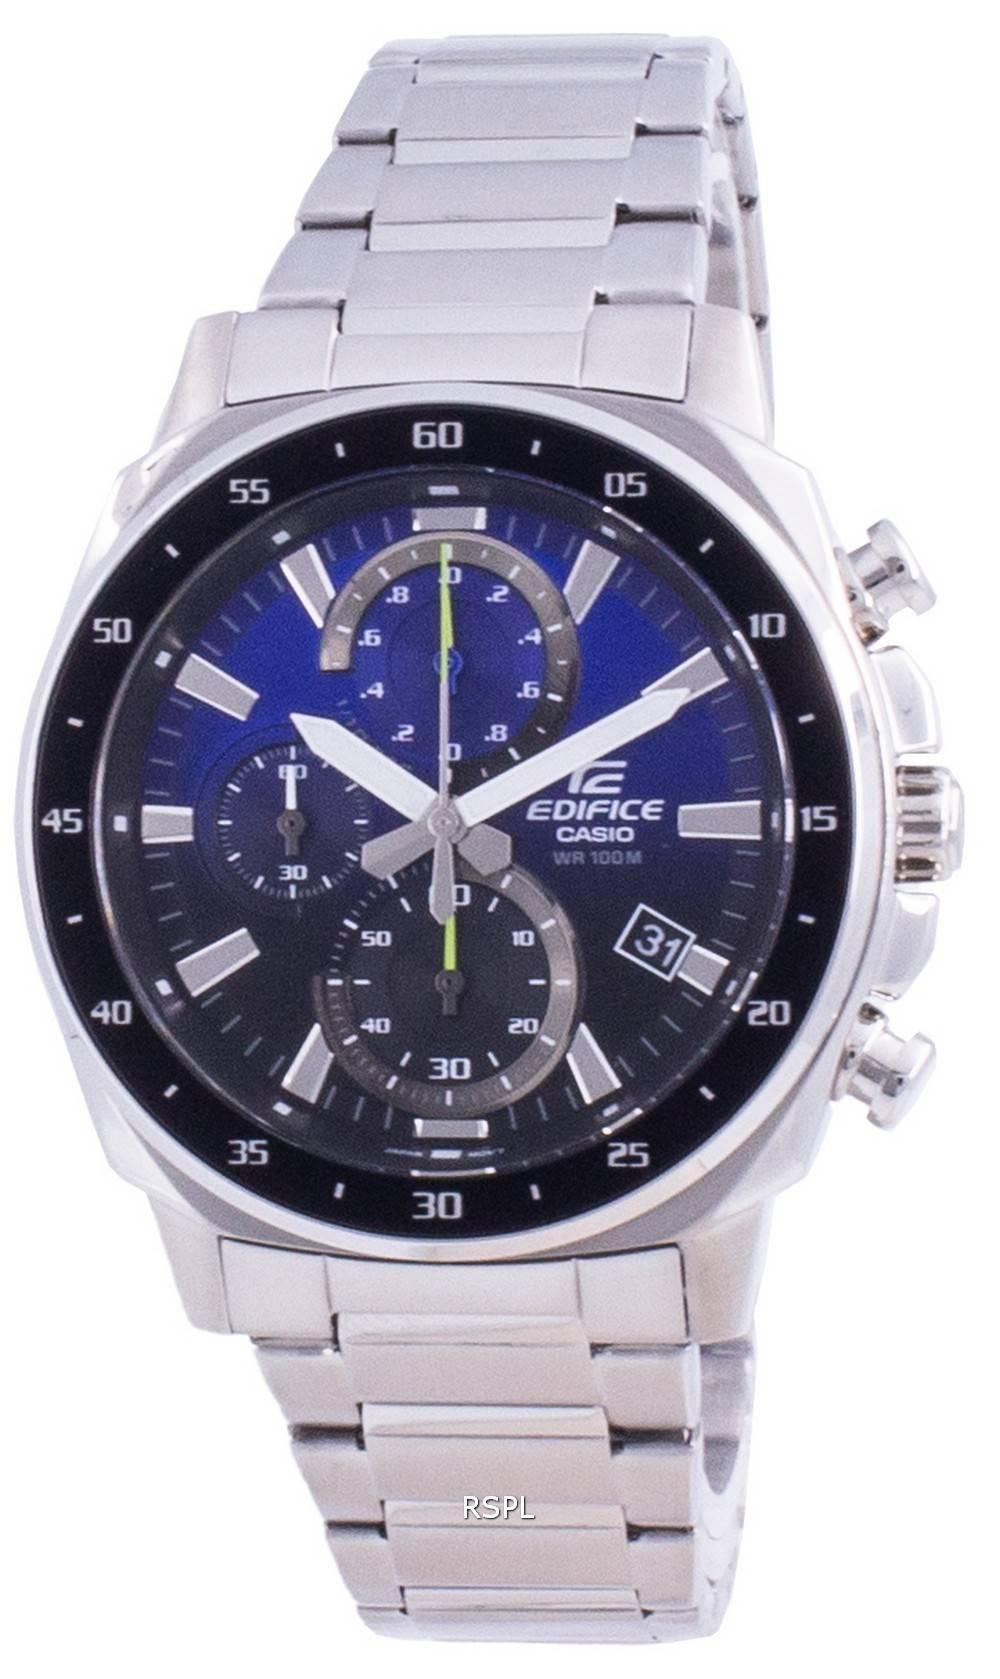 Casio rakennuksen standardi ajanoton kvartsi EFV-600D-2A EFV600D-2 100M miesten kello